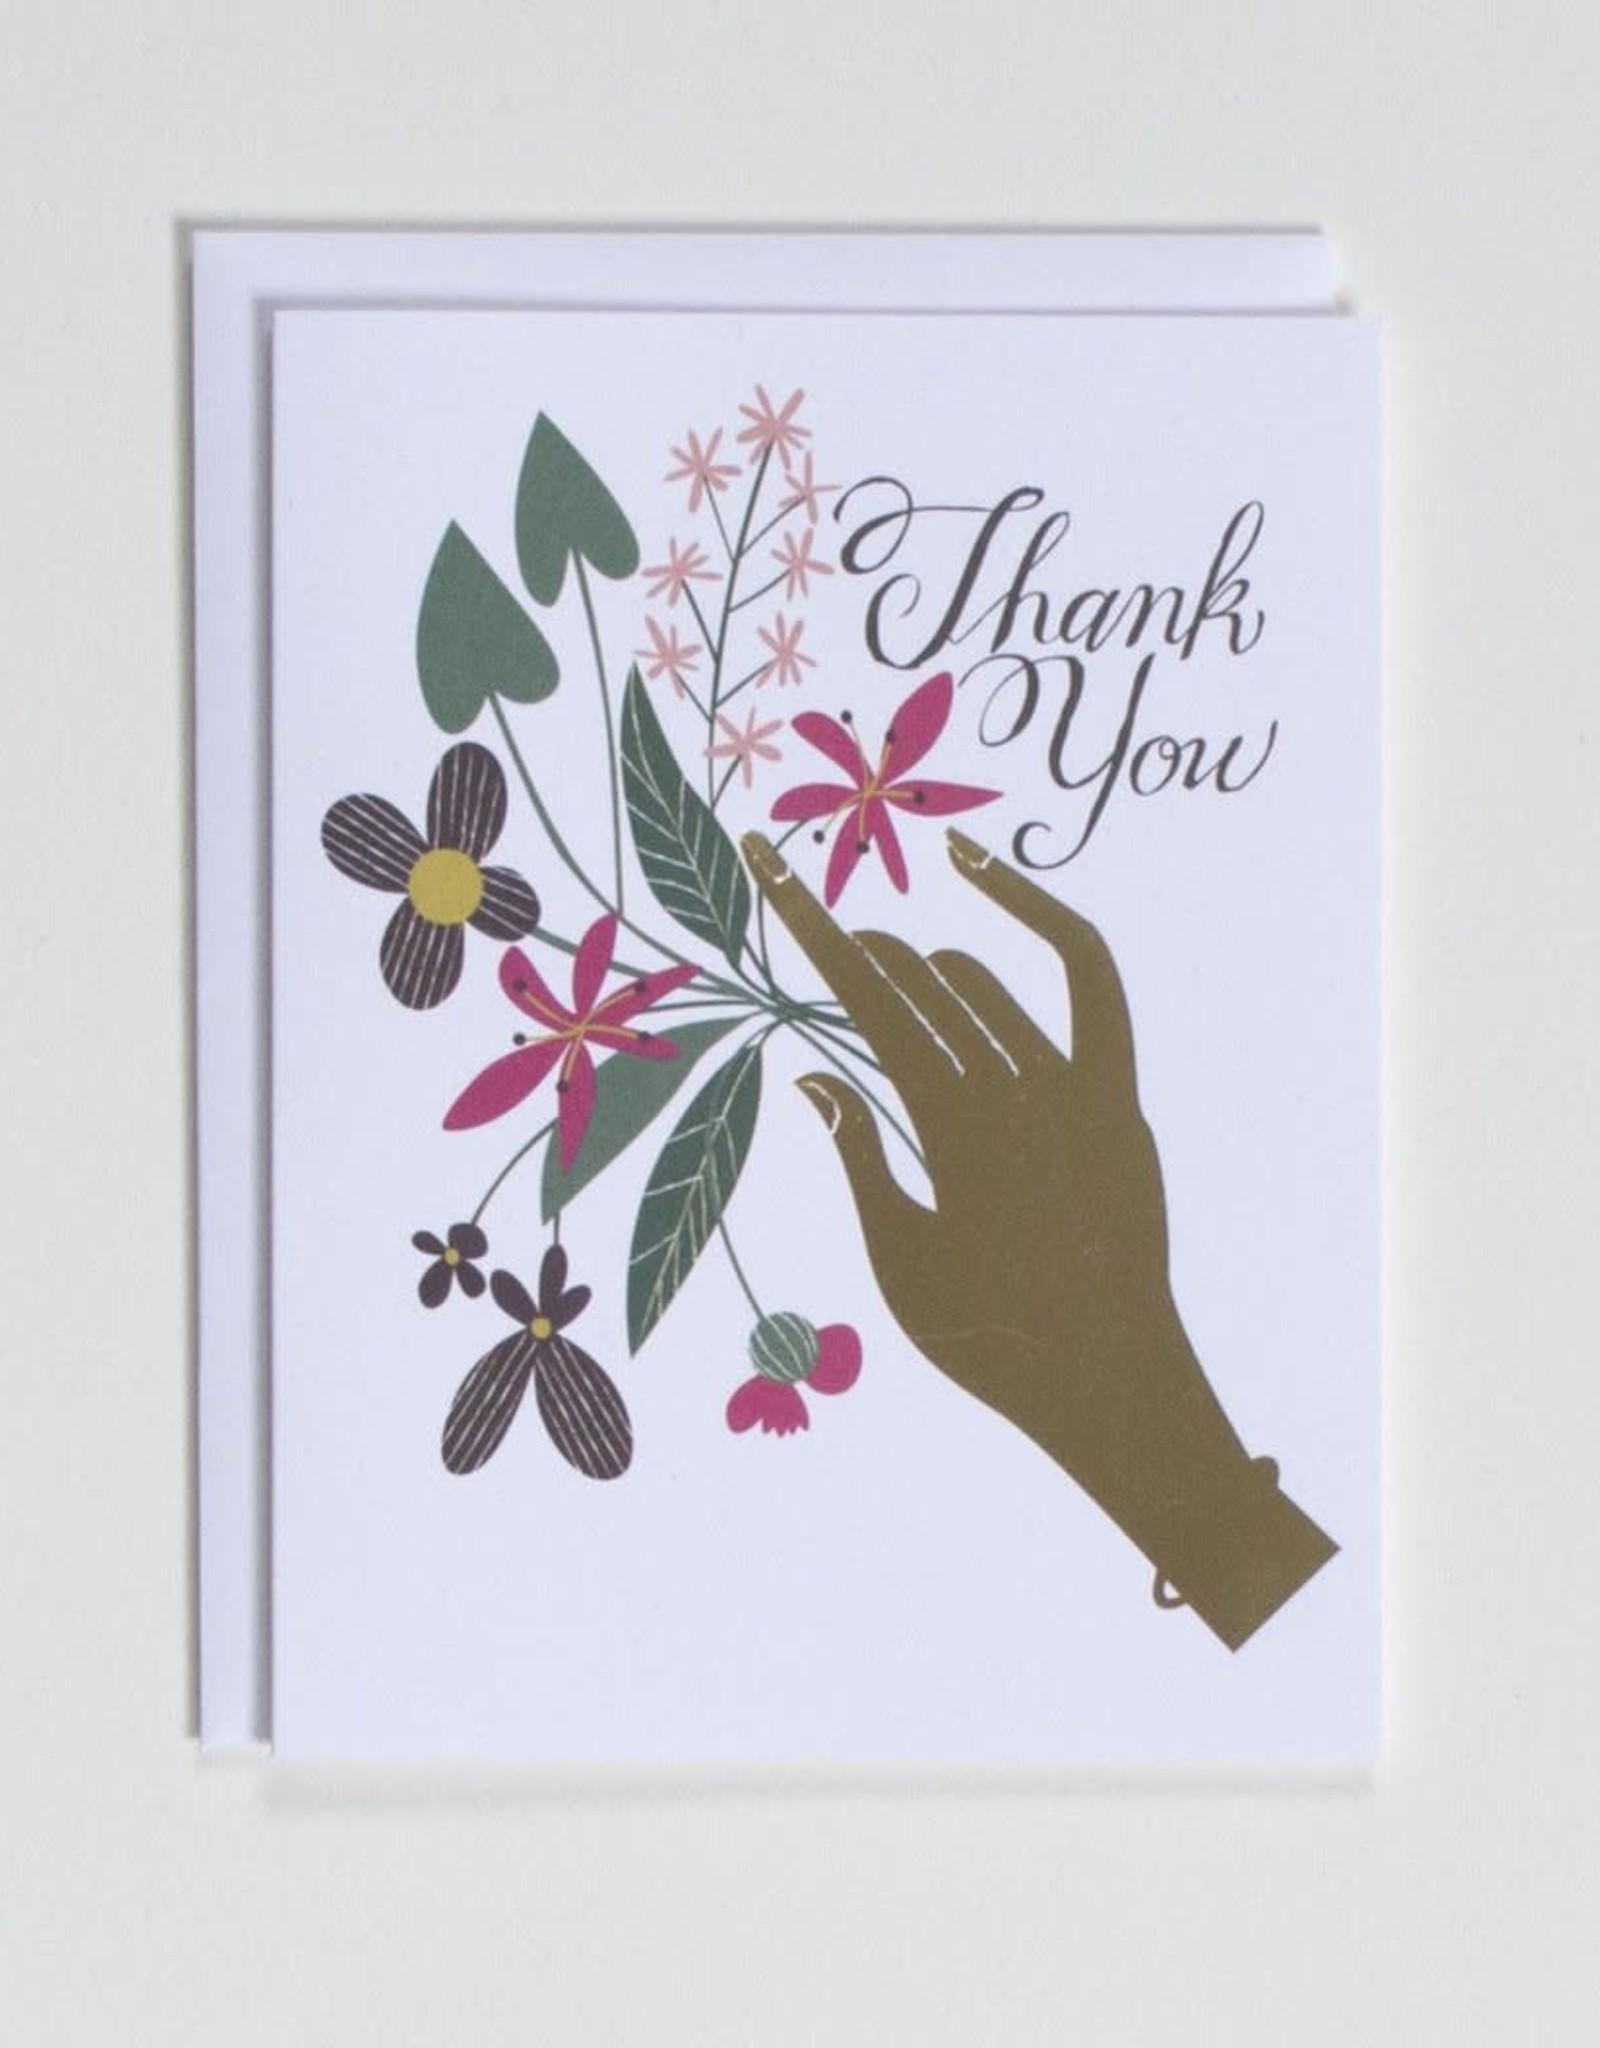 Banquet Atelier & Workshop Gold Foil Thank You - Note Card